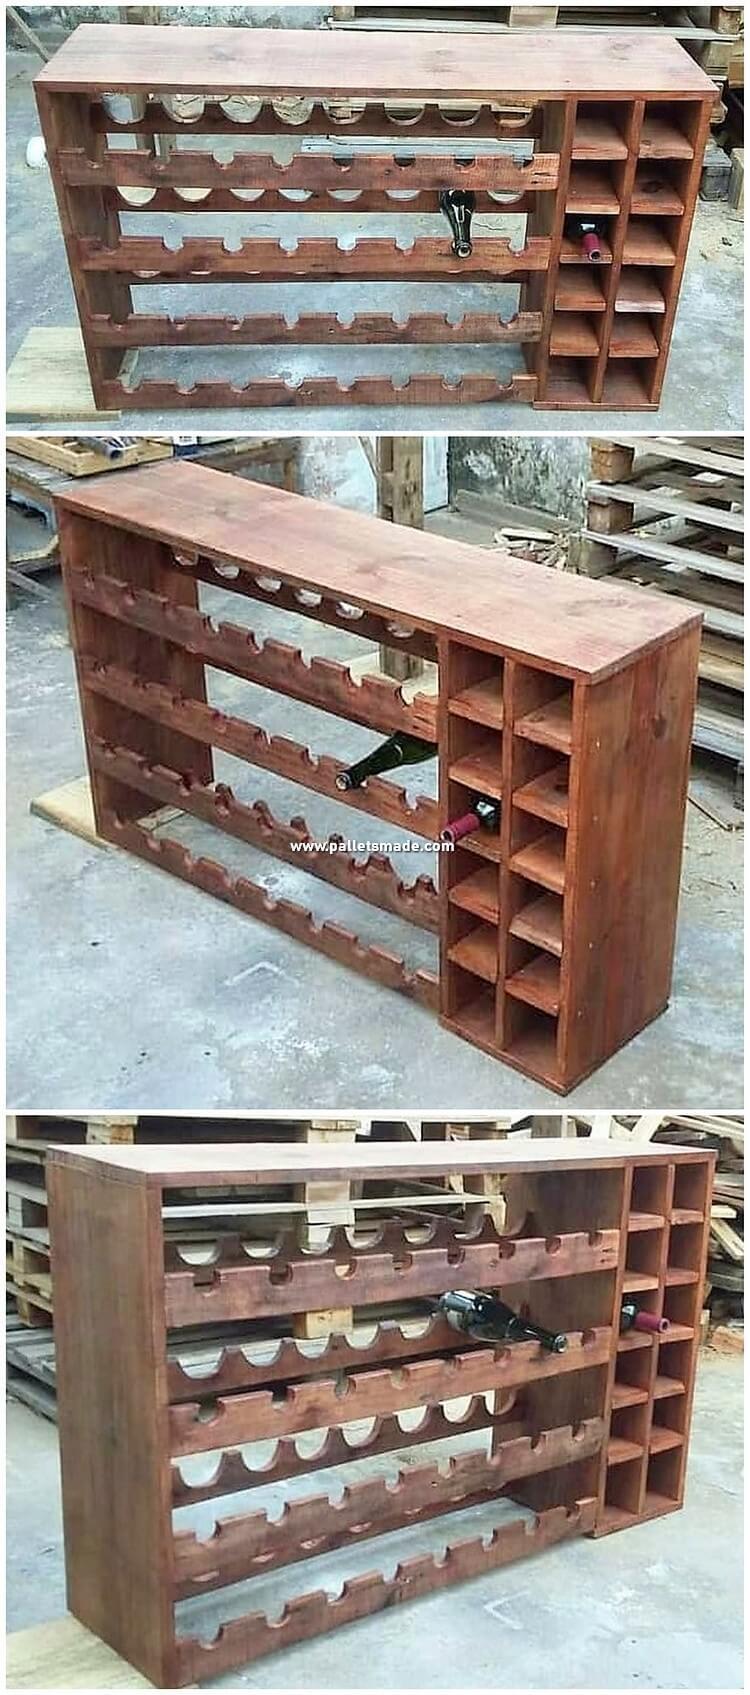 Pallet Shelving Cabinet or Wine Rack